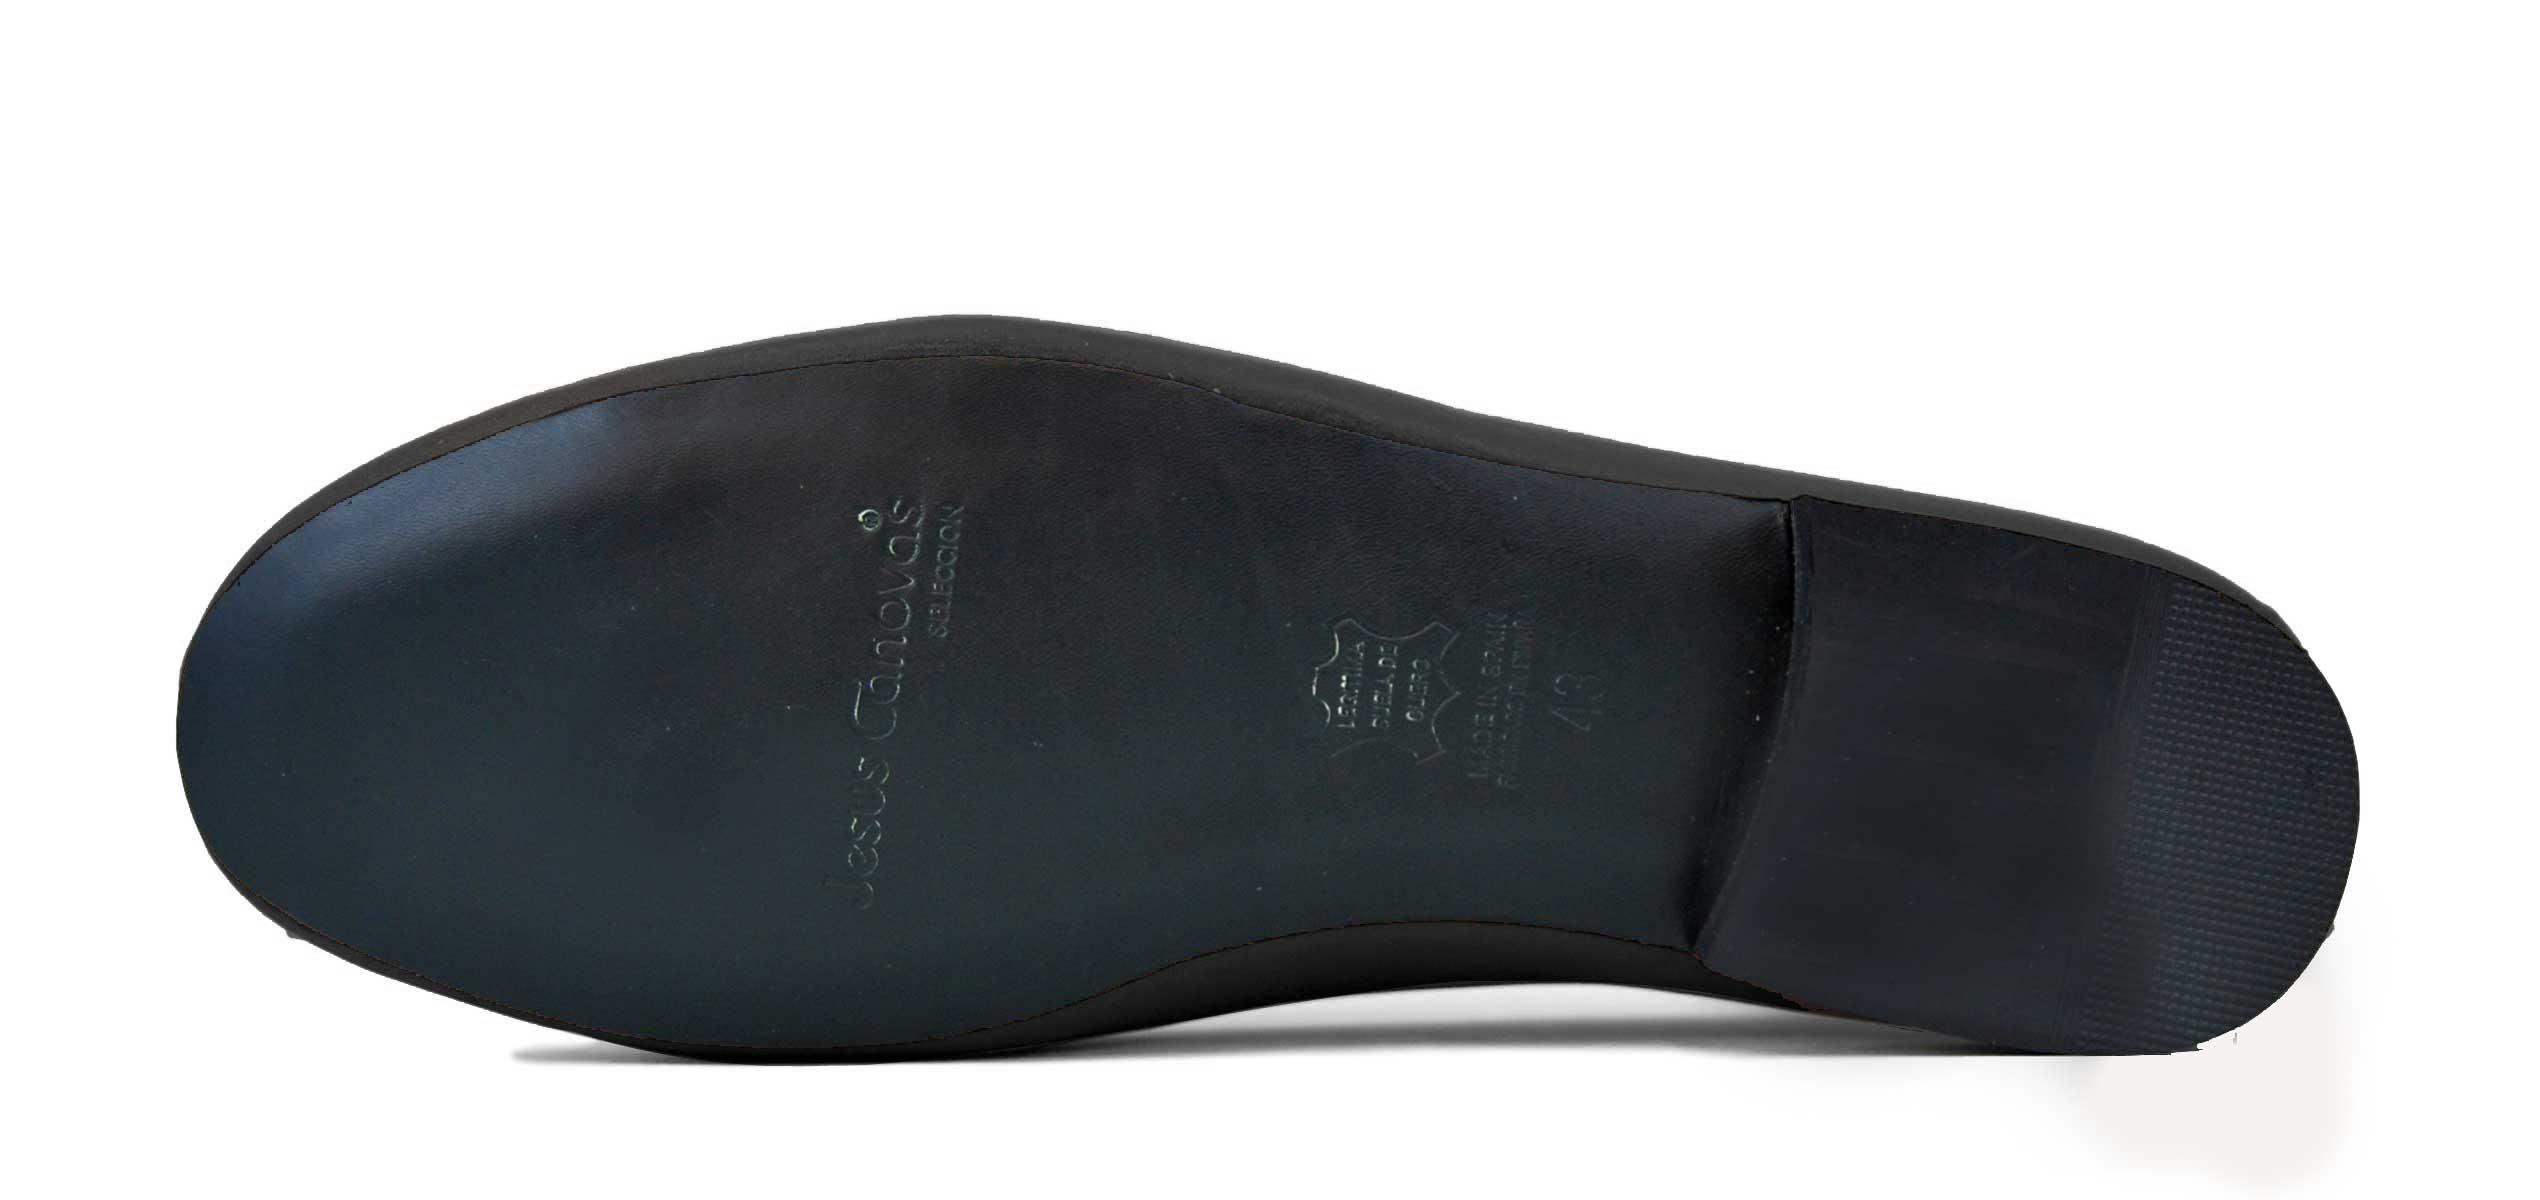 Foto 3 de Zapatos Julio Iglesias 528 JC Graphite Piel Napa